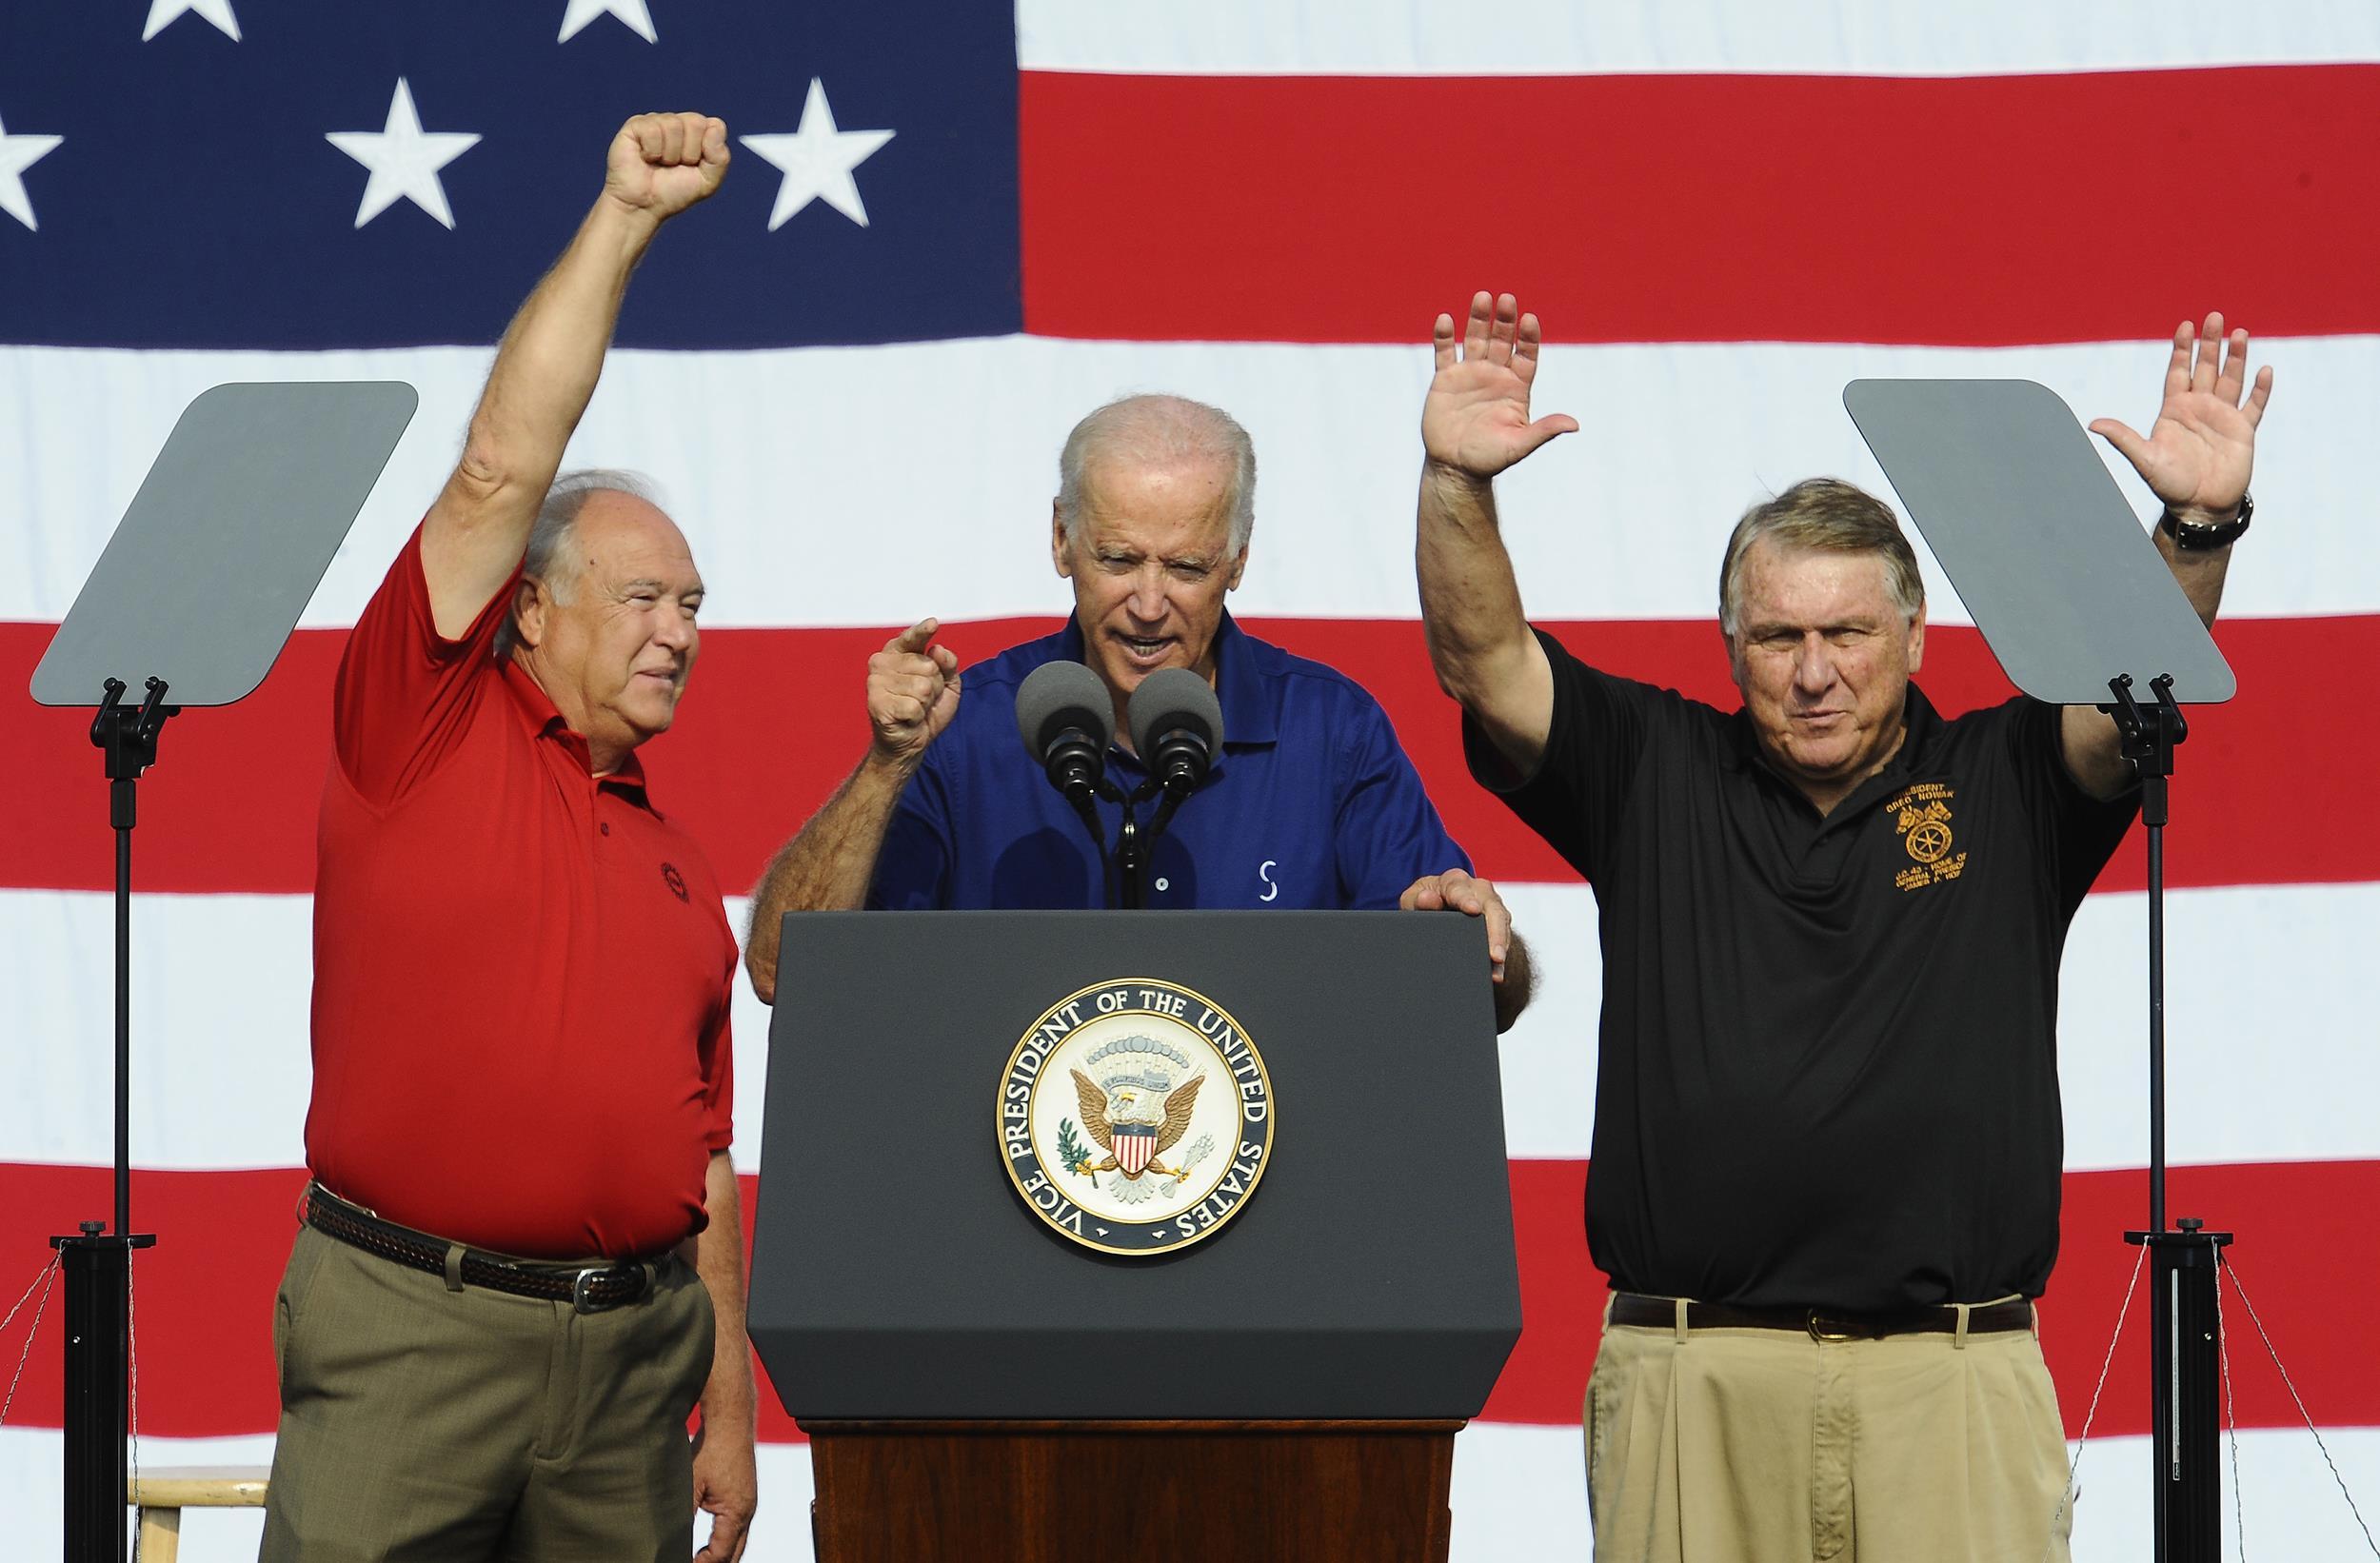 Image: UAW President Dennis Williams, United States Vice President Joe Biden and Teamsters President James Hoffa